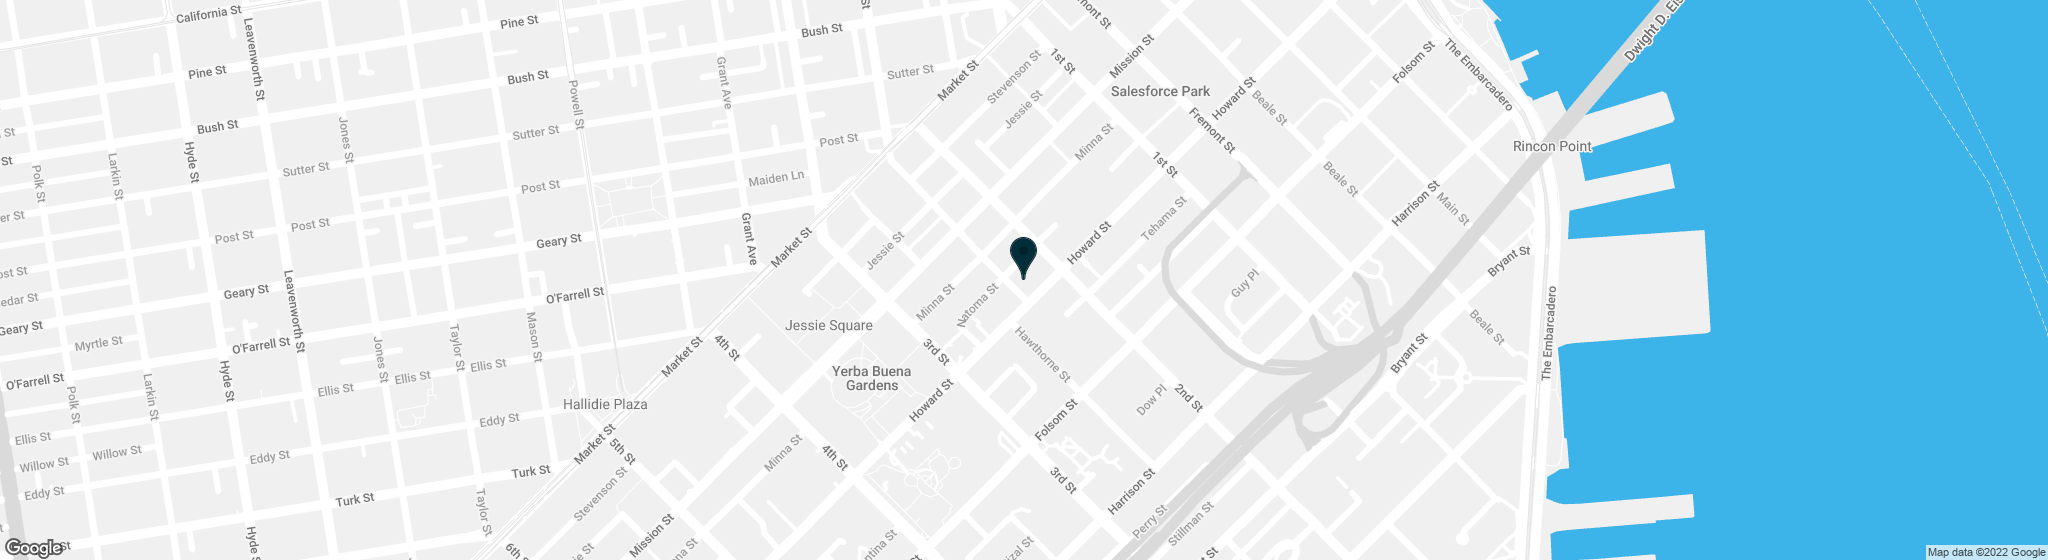 199 New Montgomery #509 San Francisco CA 94105